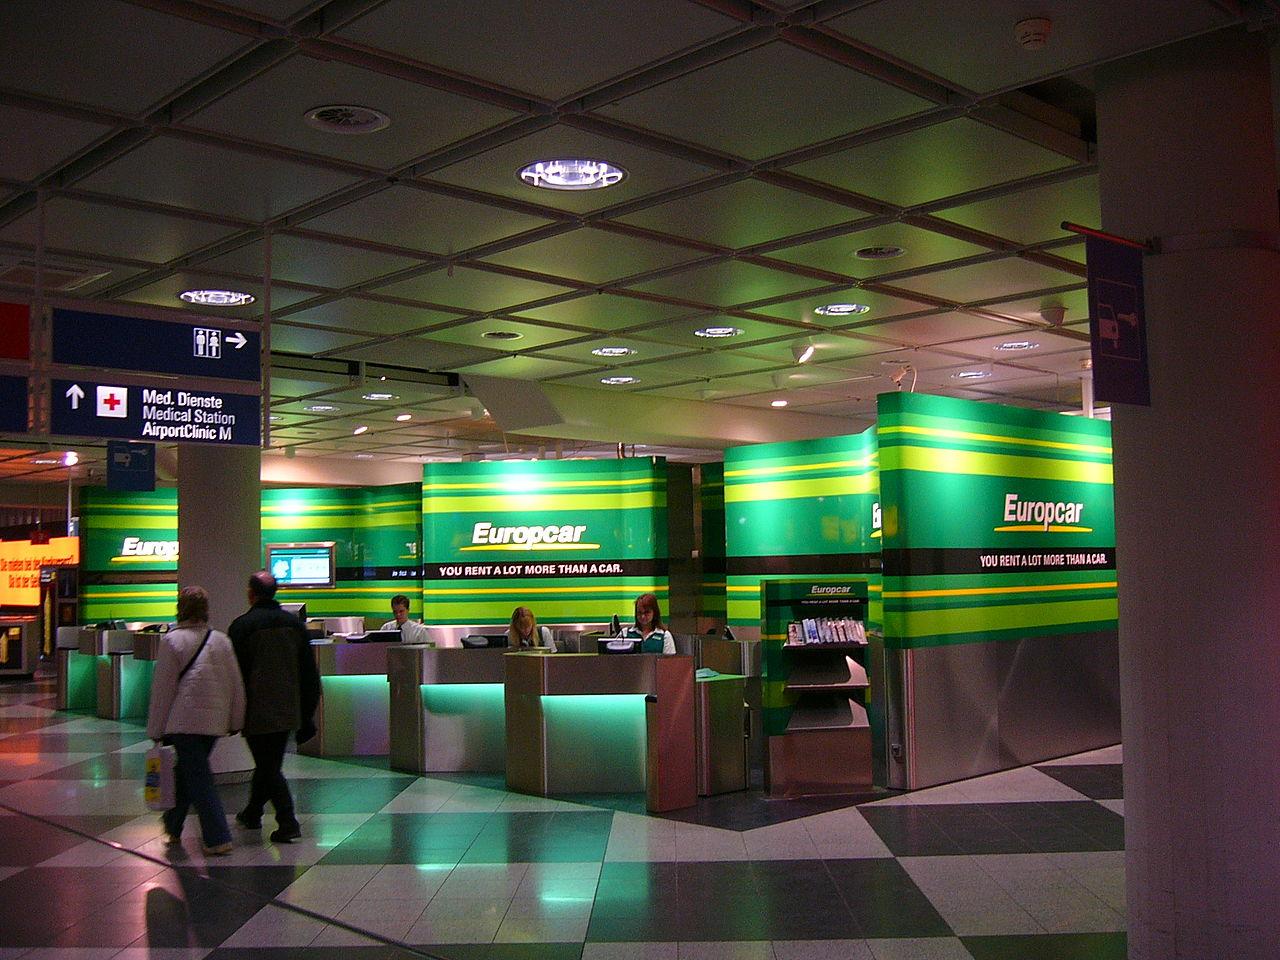 Alquiler de coches-Europcar